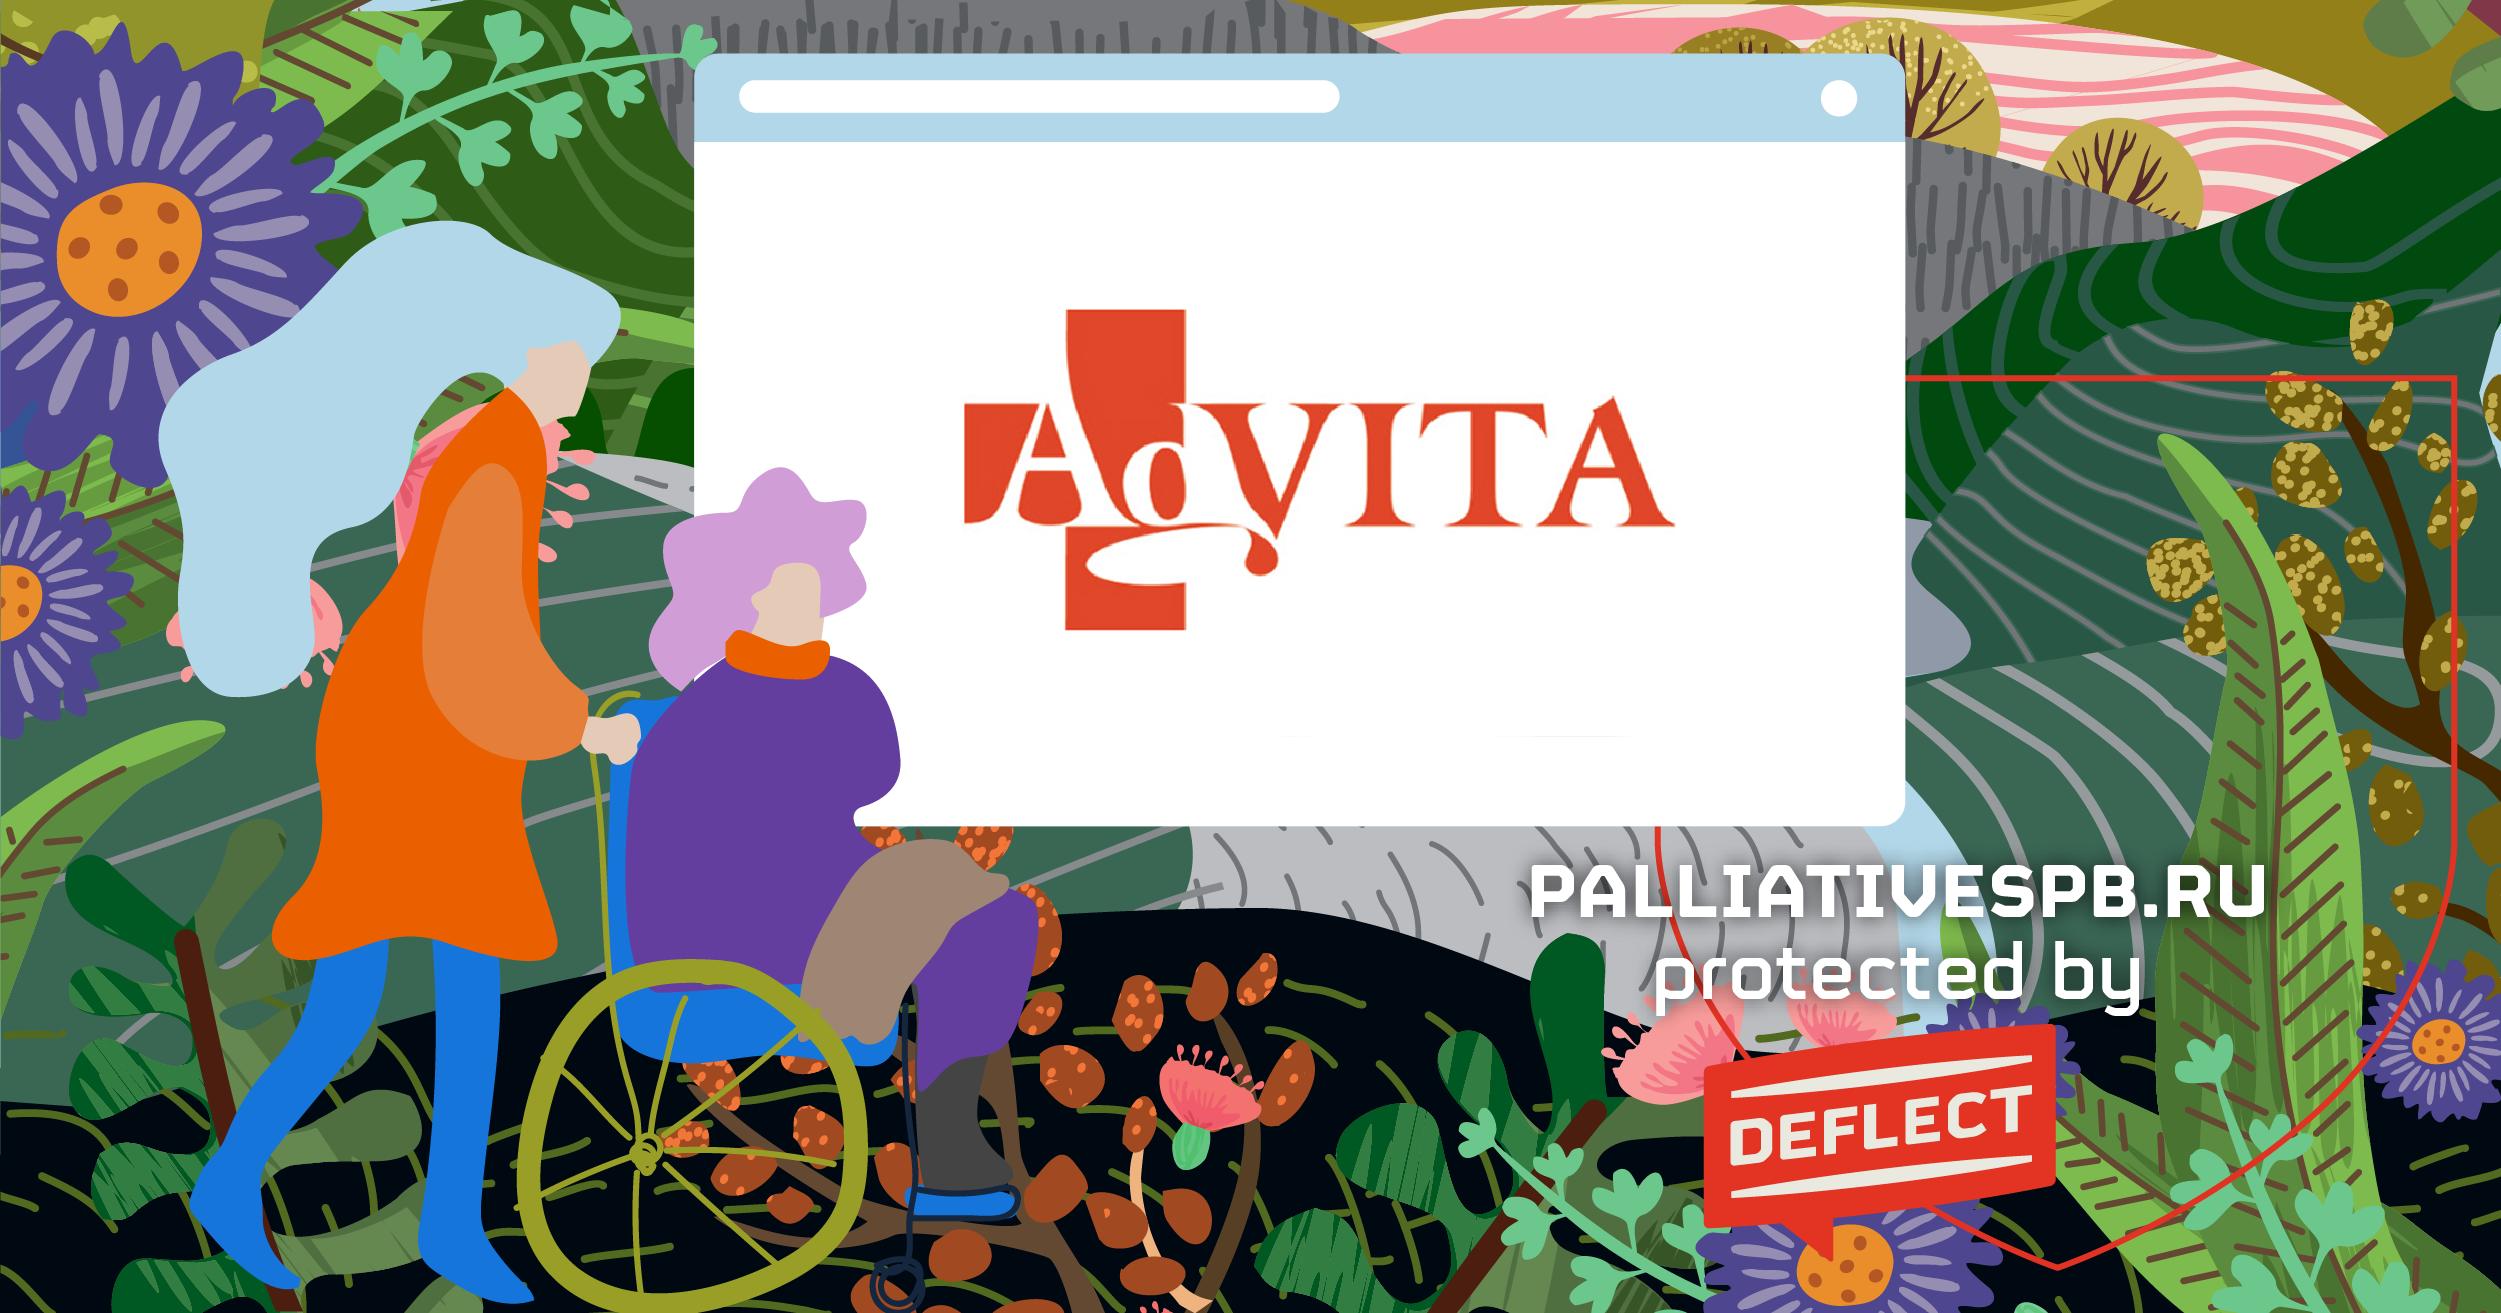 AdVita Foundation